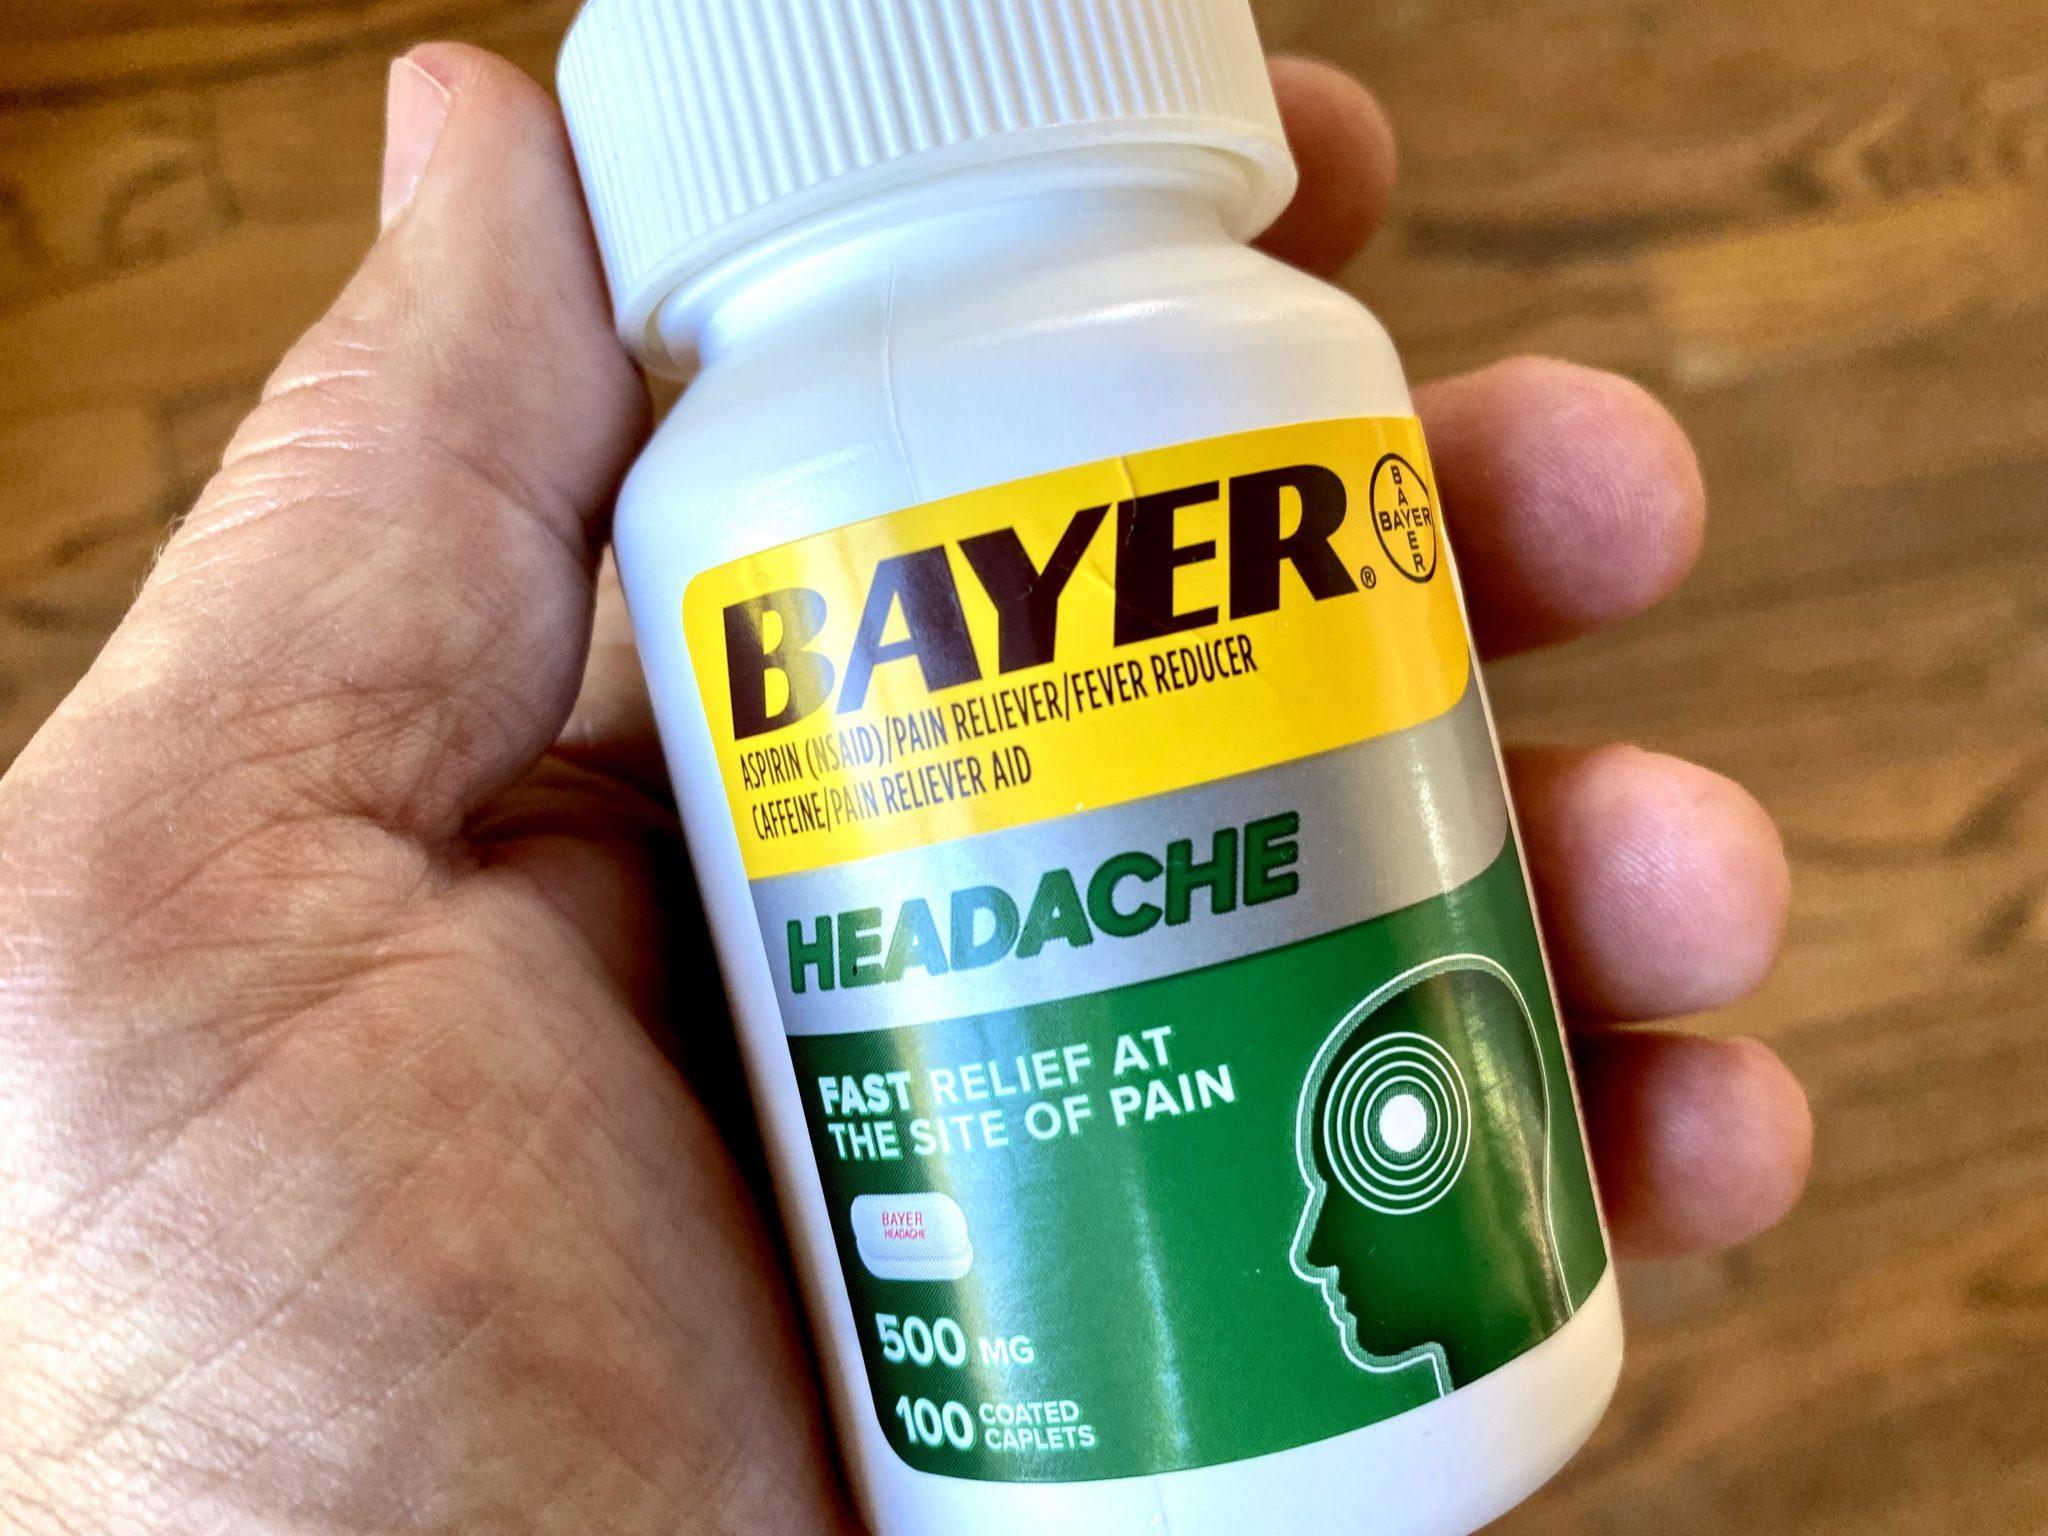 Bayer Headache medication bottle in man's hand